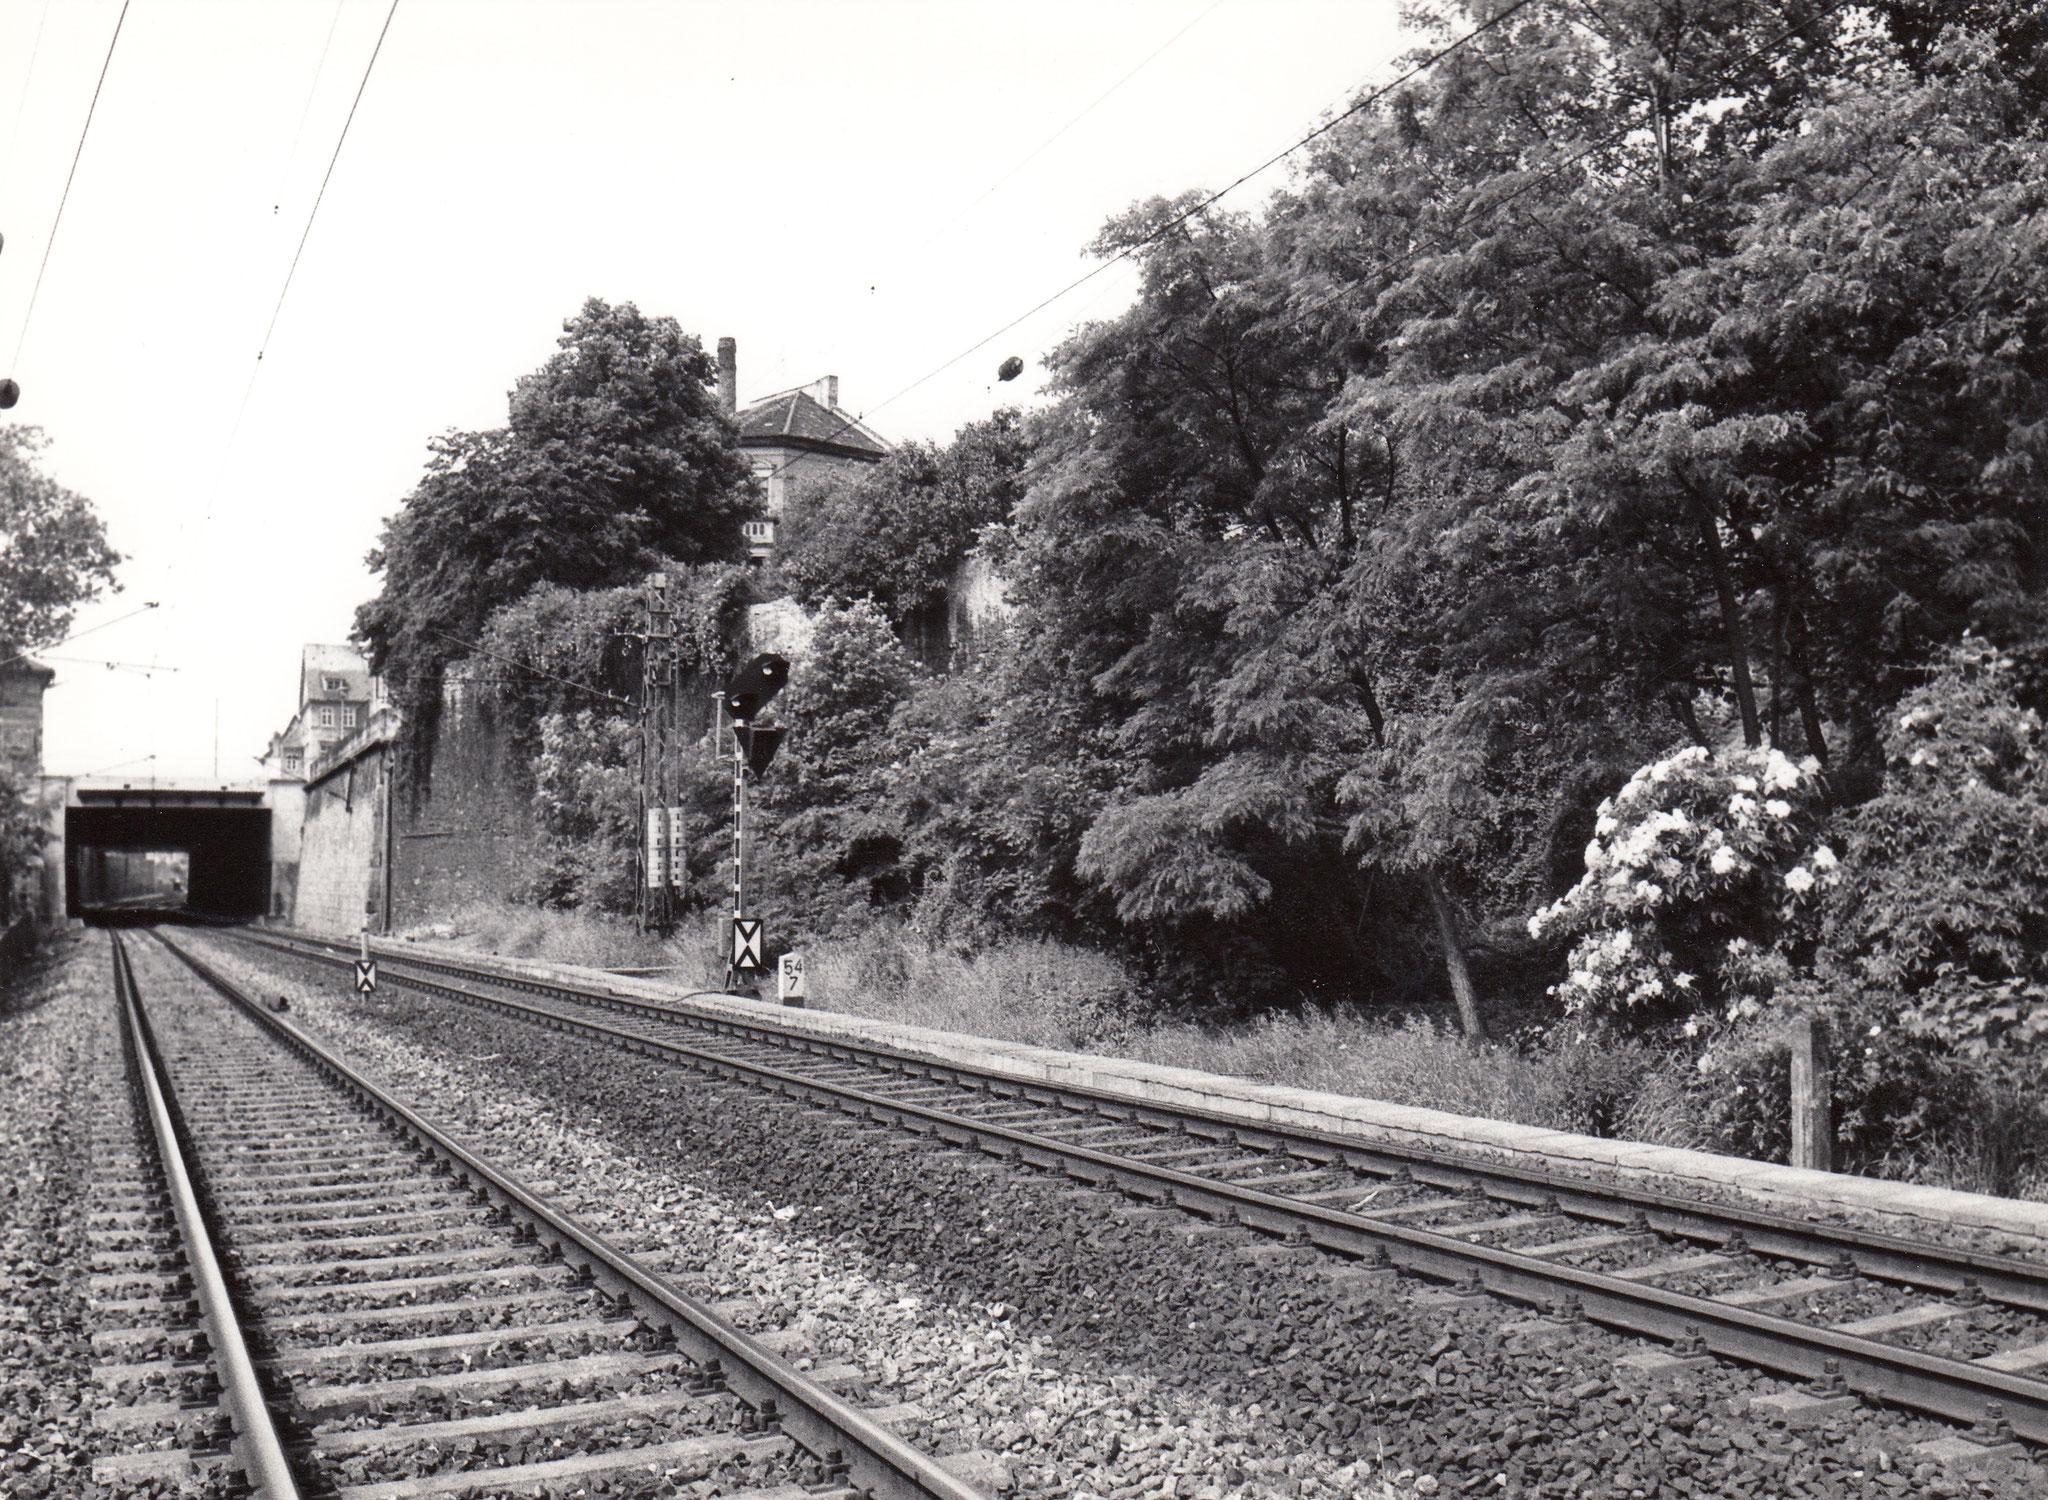 Nahtstelle Stadtmauer und Stützmauer entlang den Bahngleisen